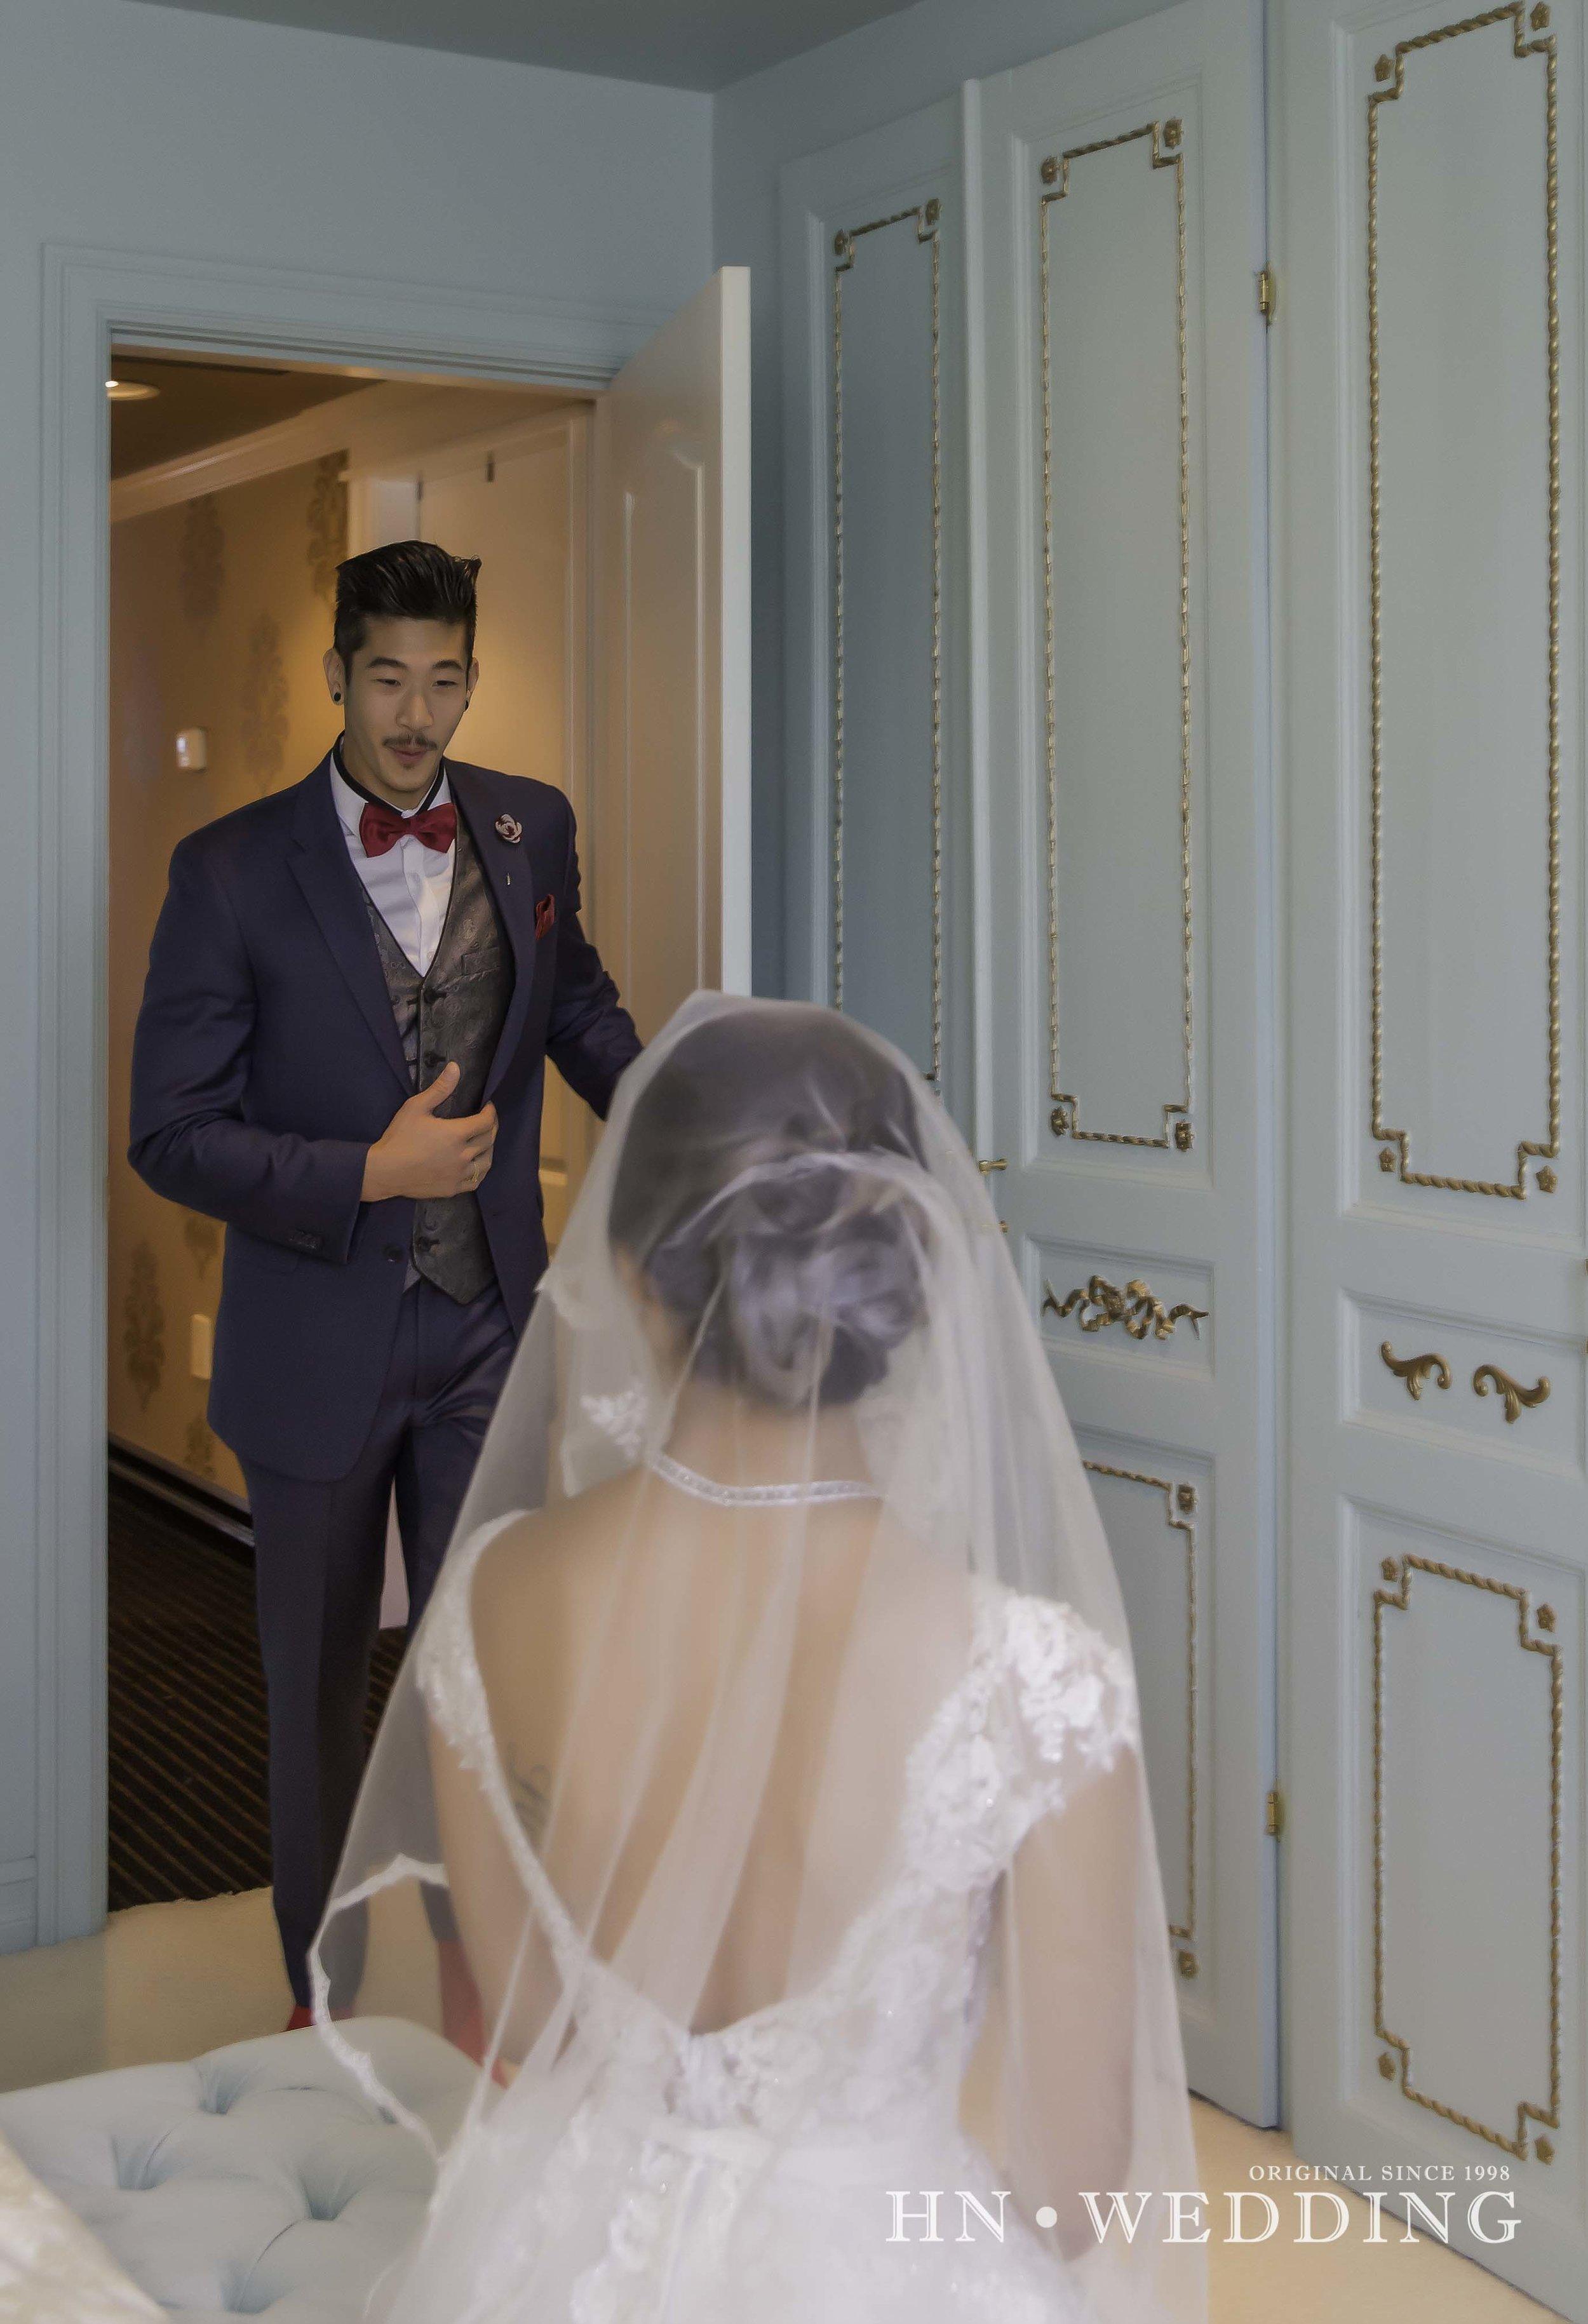 HNwedding-20160815-wedding-010.jpg